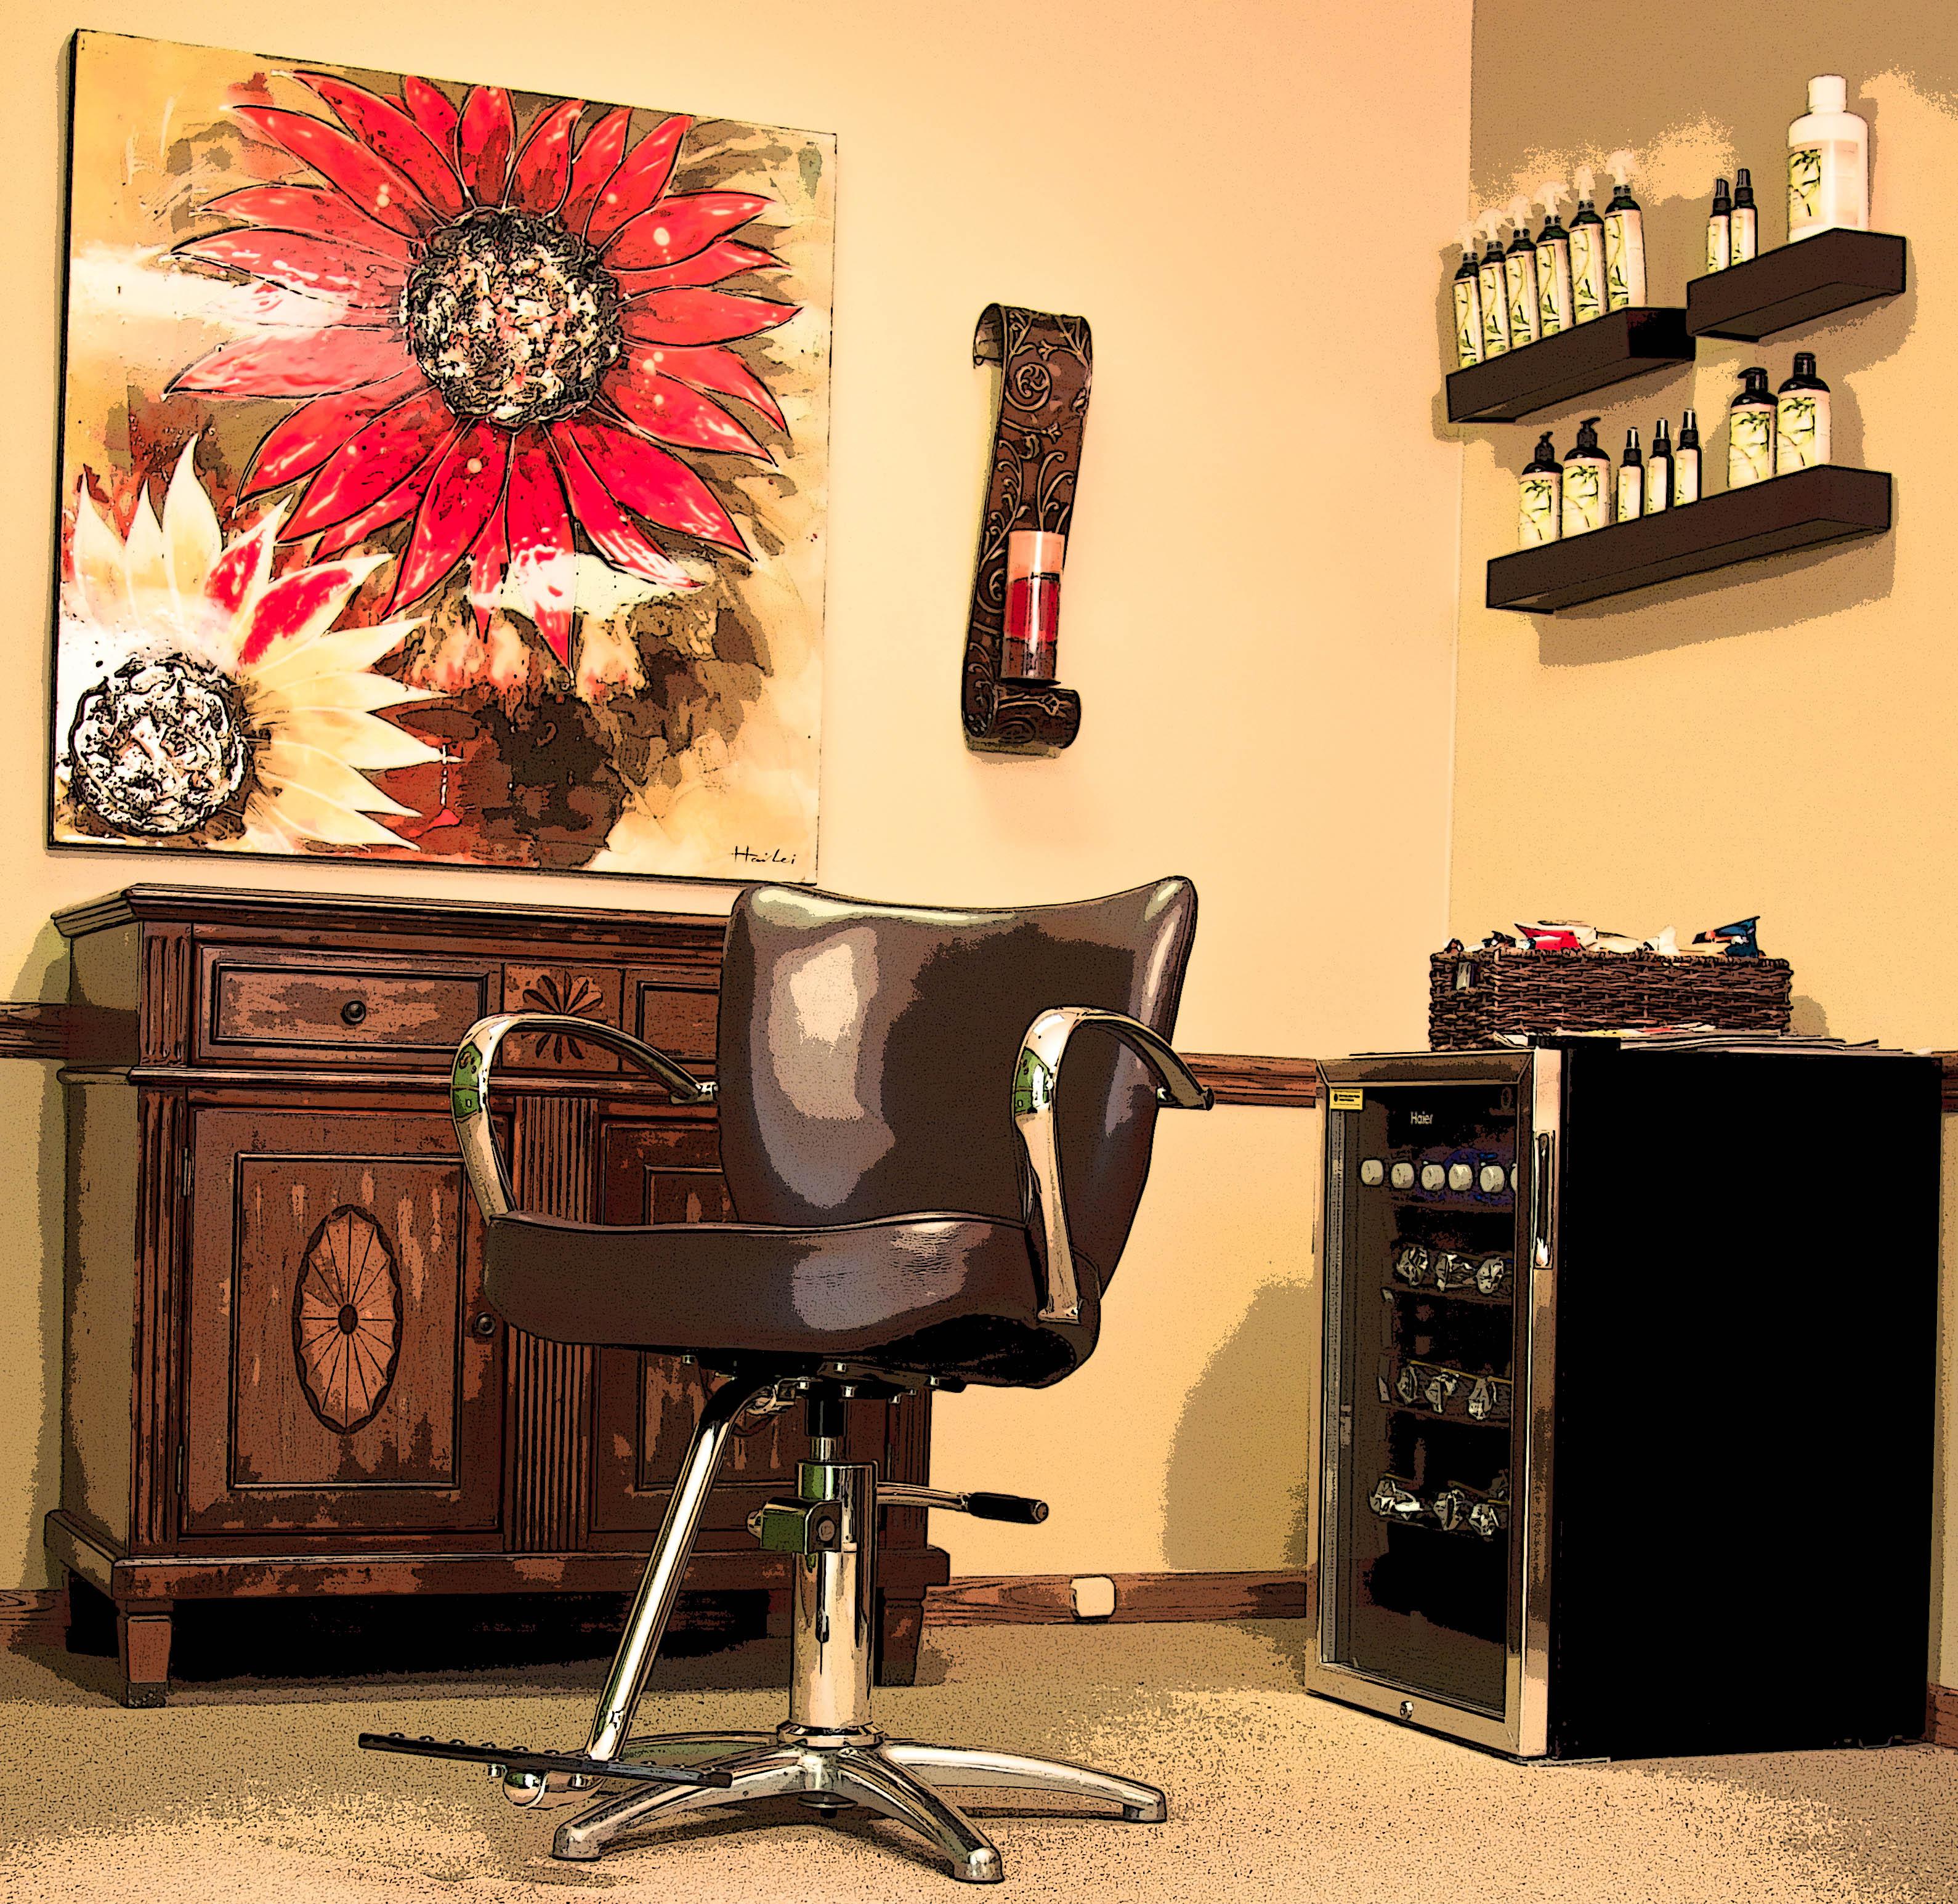 Head Lice Treatment Facility Atlanta - Lice Removal Specialist